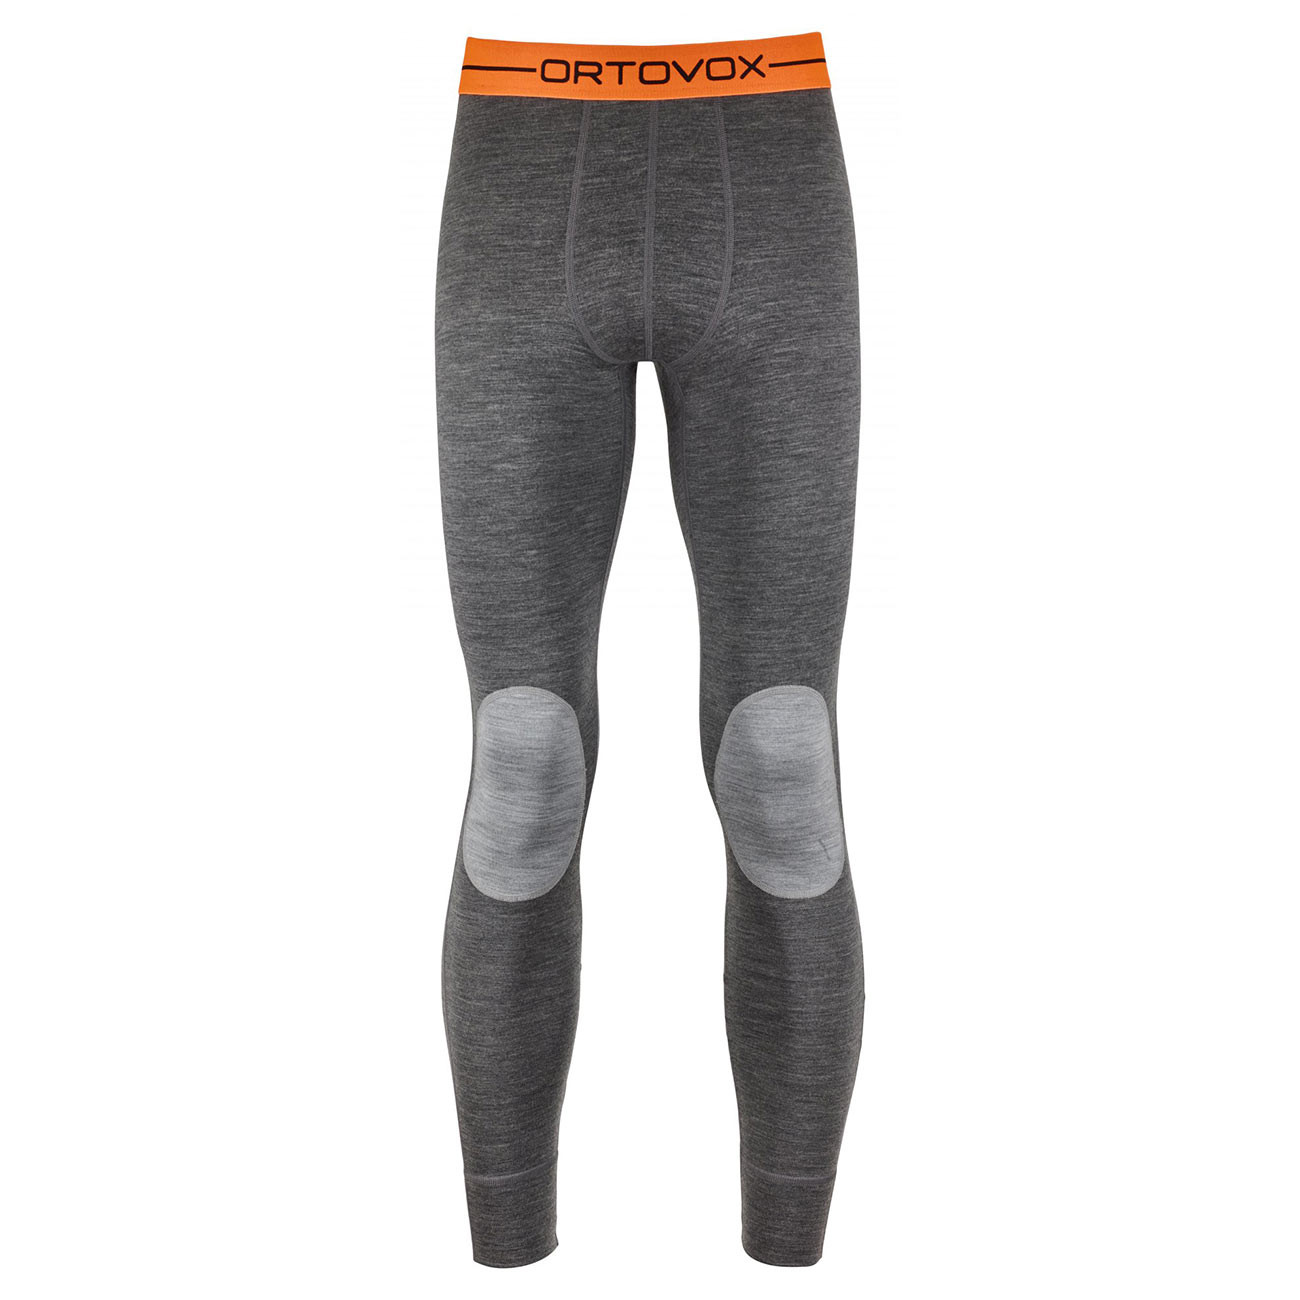 Spodky Ortovox Rock'n'wool Long Pants dark grey blend